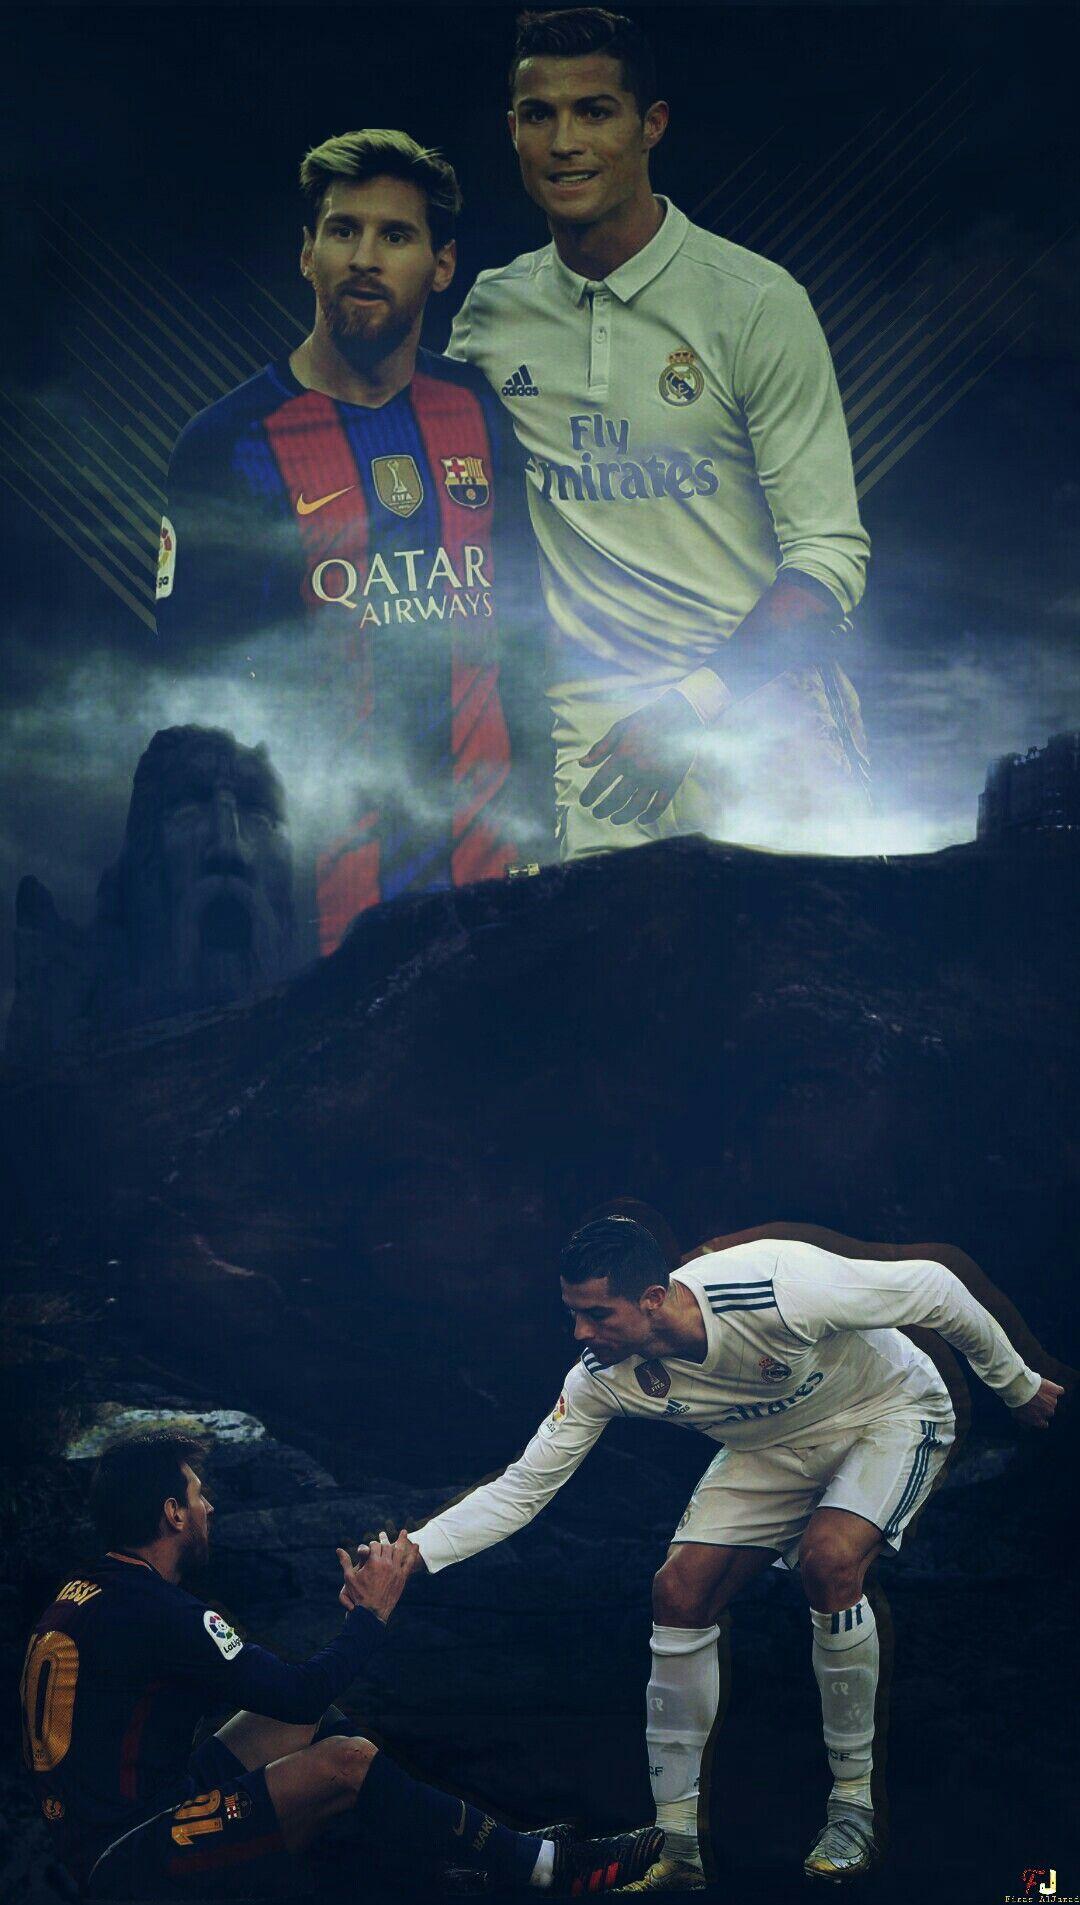 wallpaper messi & ronaldo | bóng đá | pinterest | messi, ronaldo and